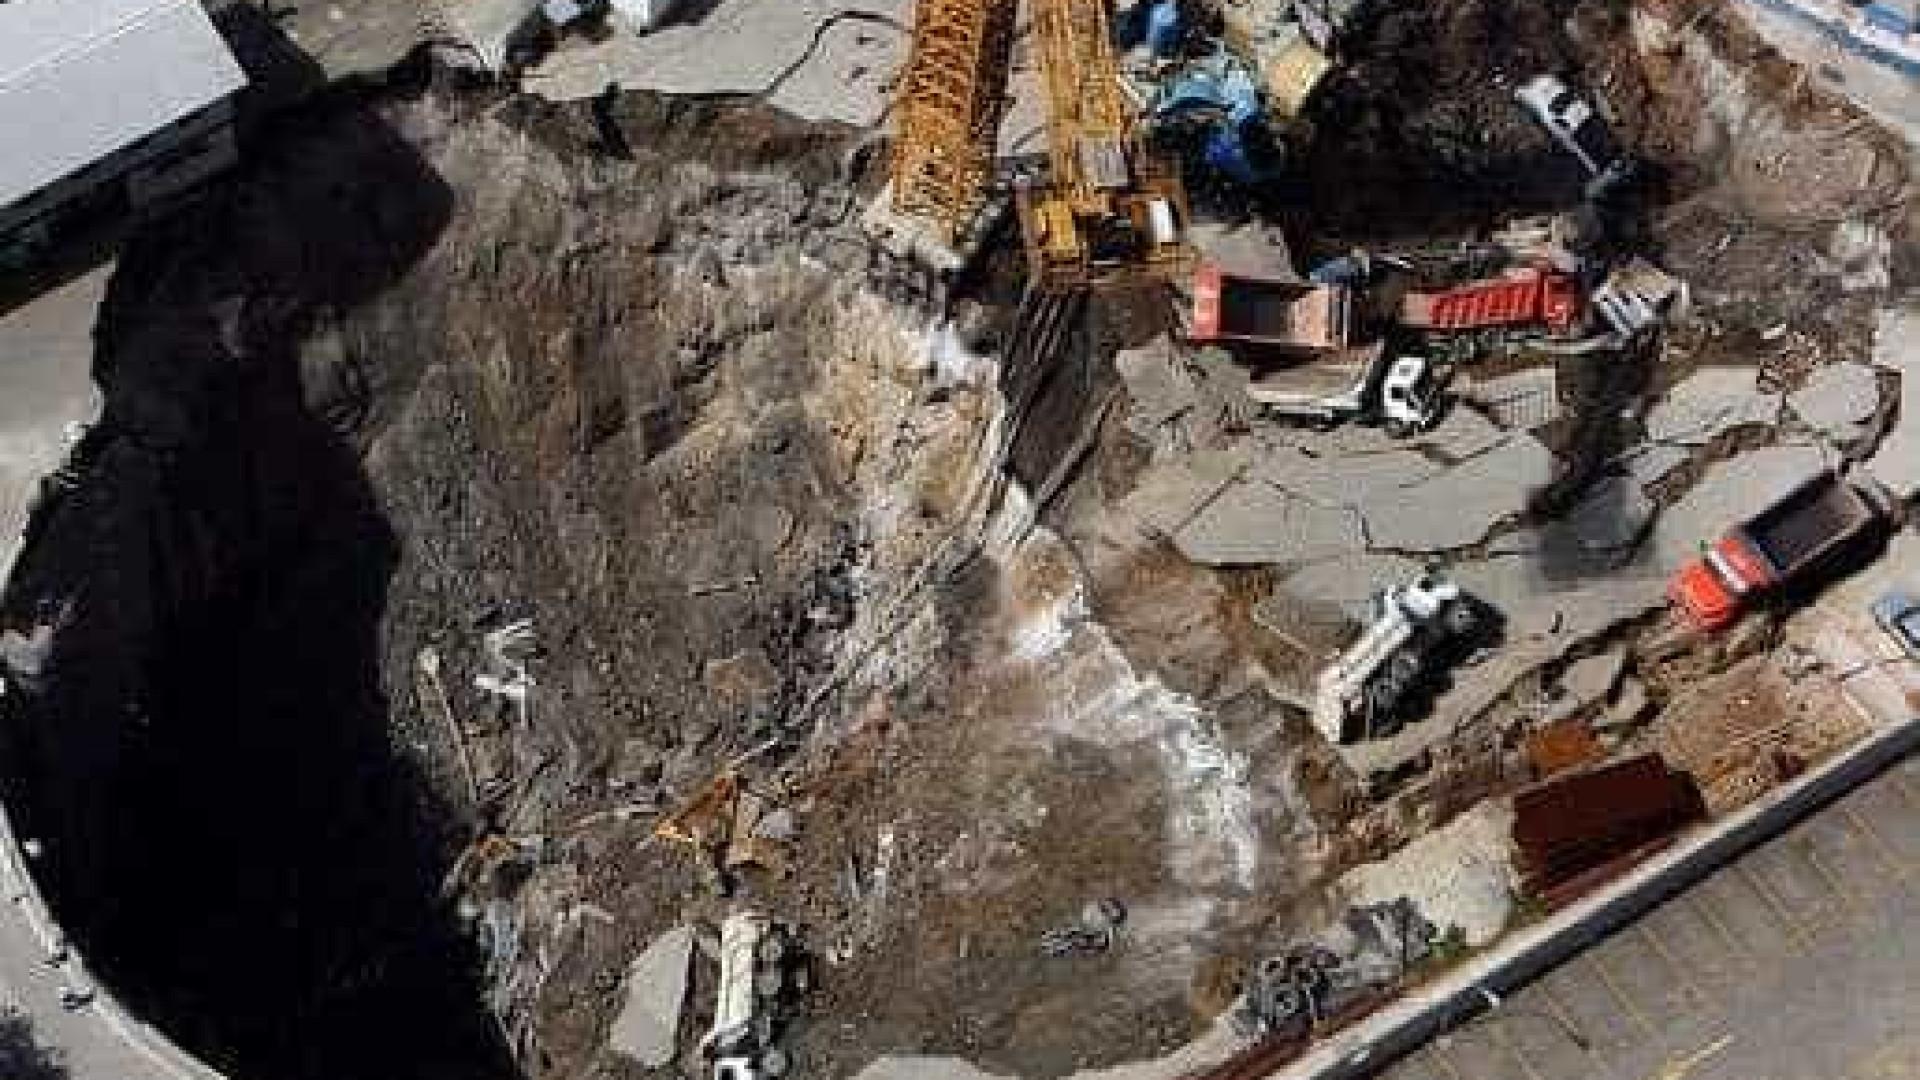 Cratera no metrô: promotores podem ser investigados por propina